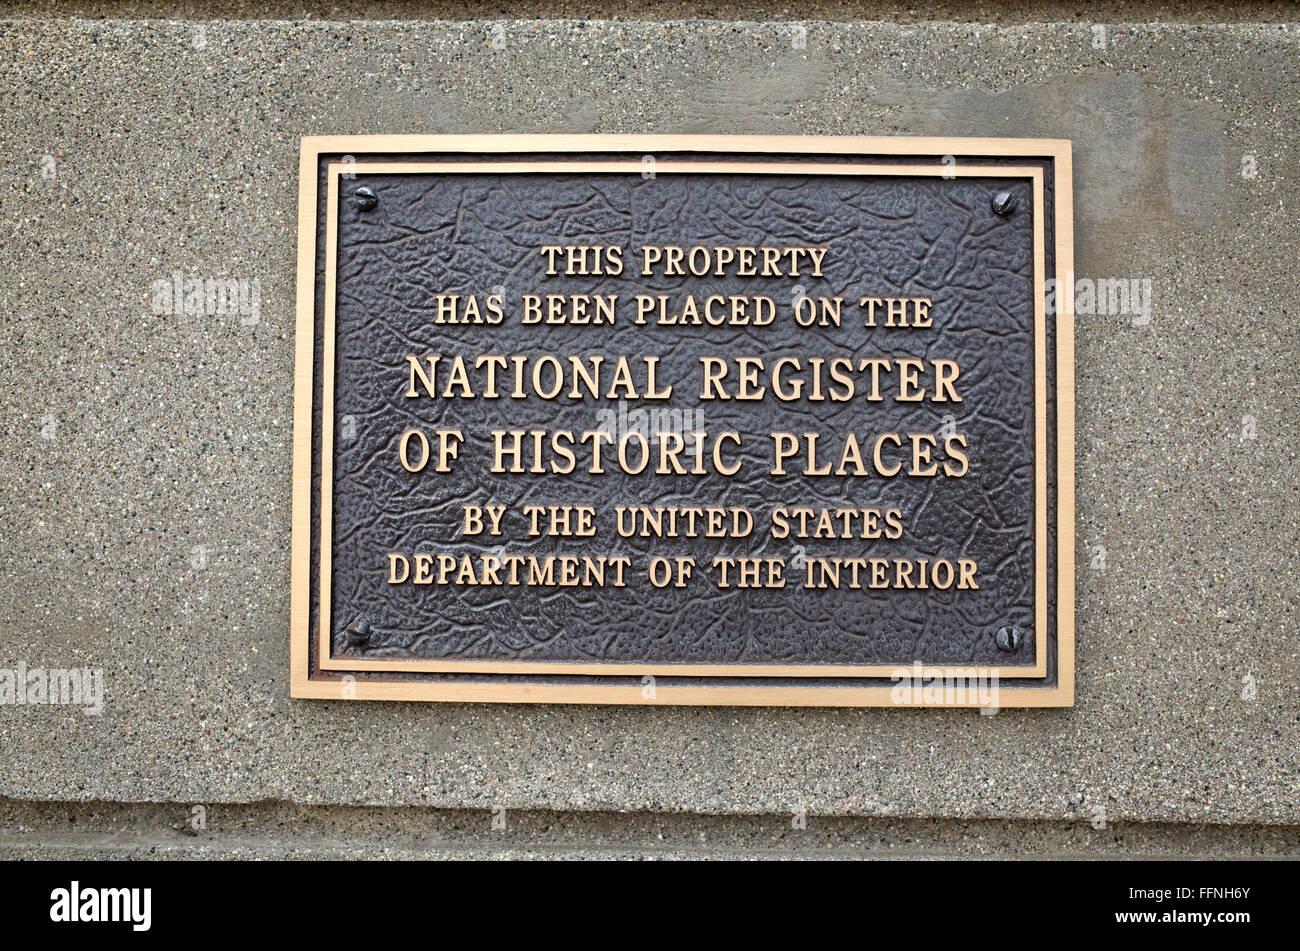 Plaque placing historic WPA fieldstone auditorium on the National Register of Historic Places. Brandon Minnesota Stock Photo